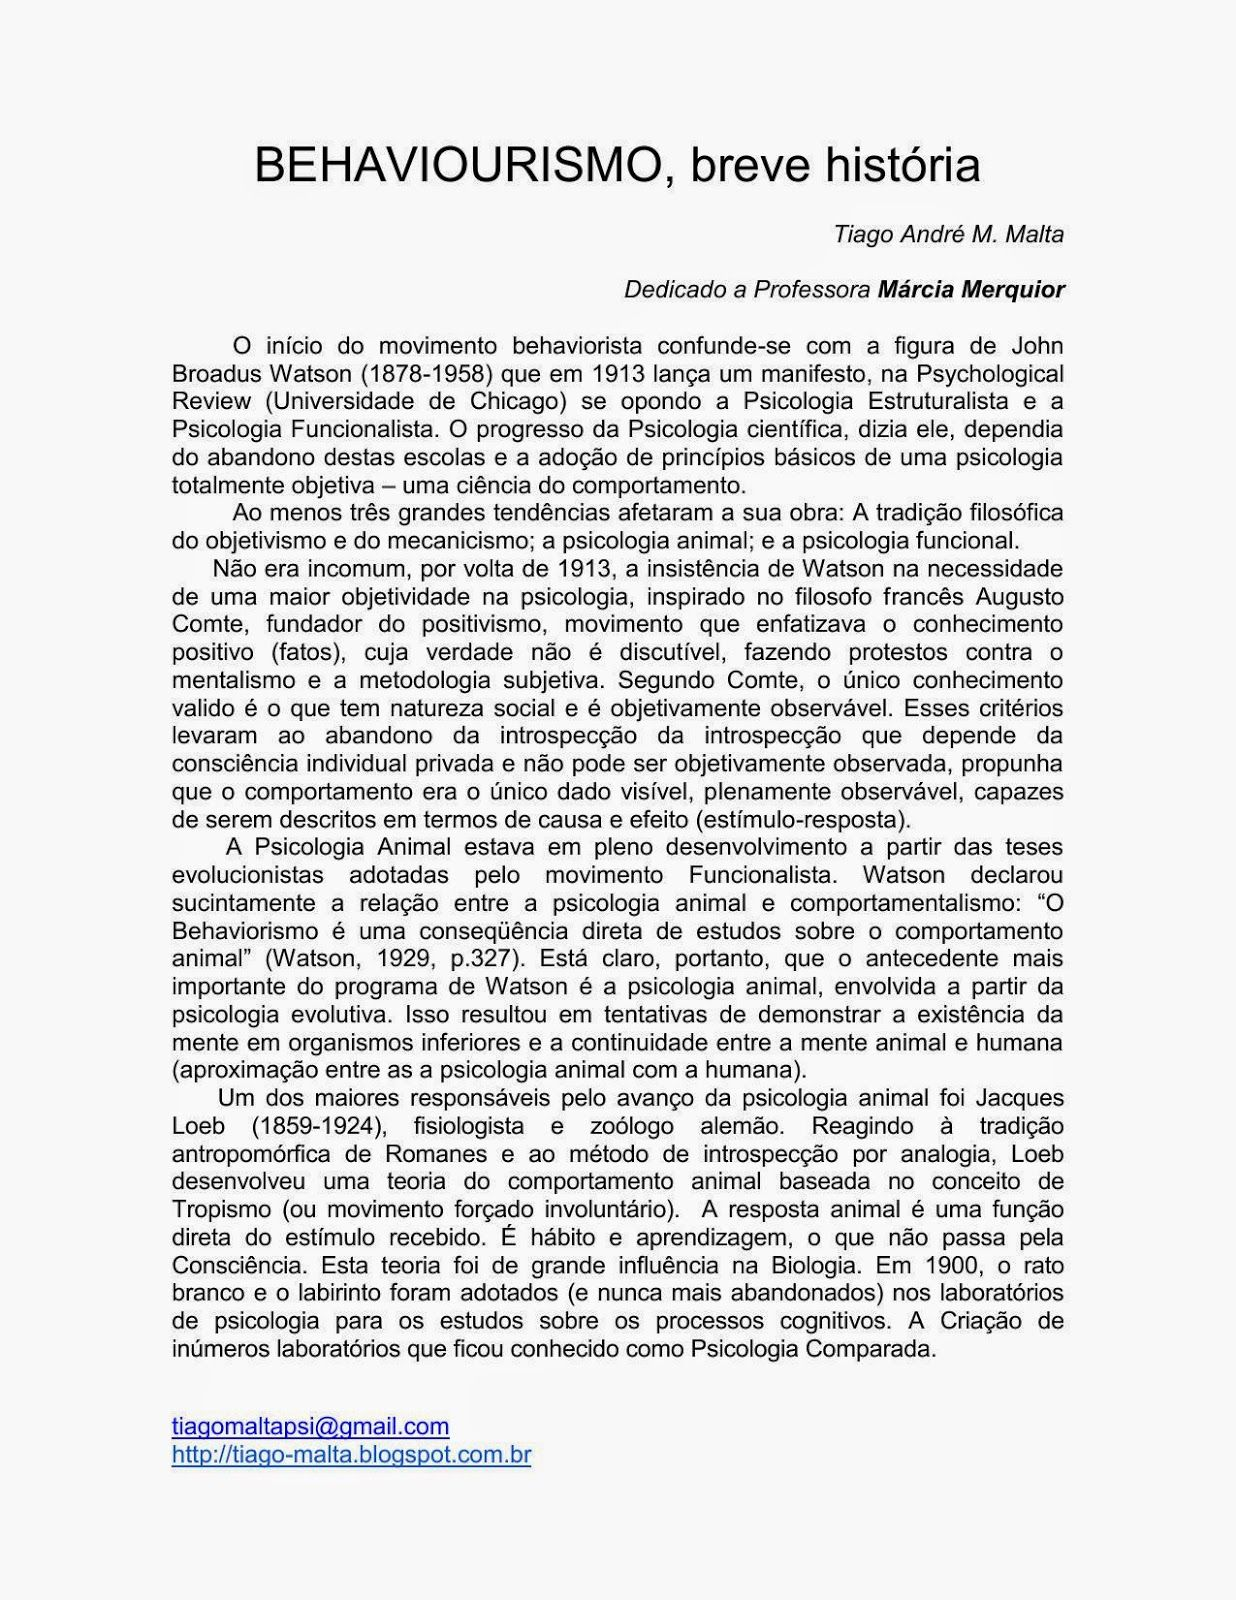 Tiago Malta: BEHAVIOURISMO, breve história